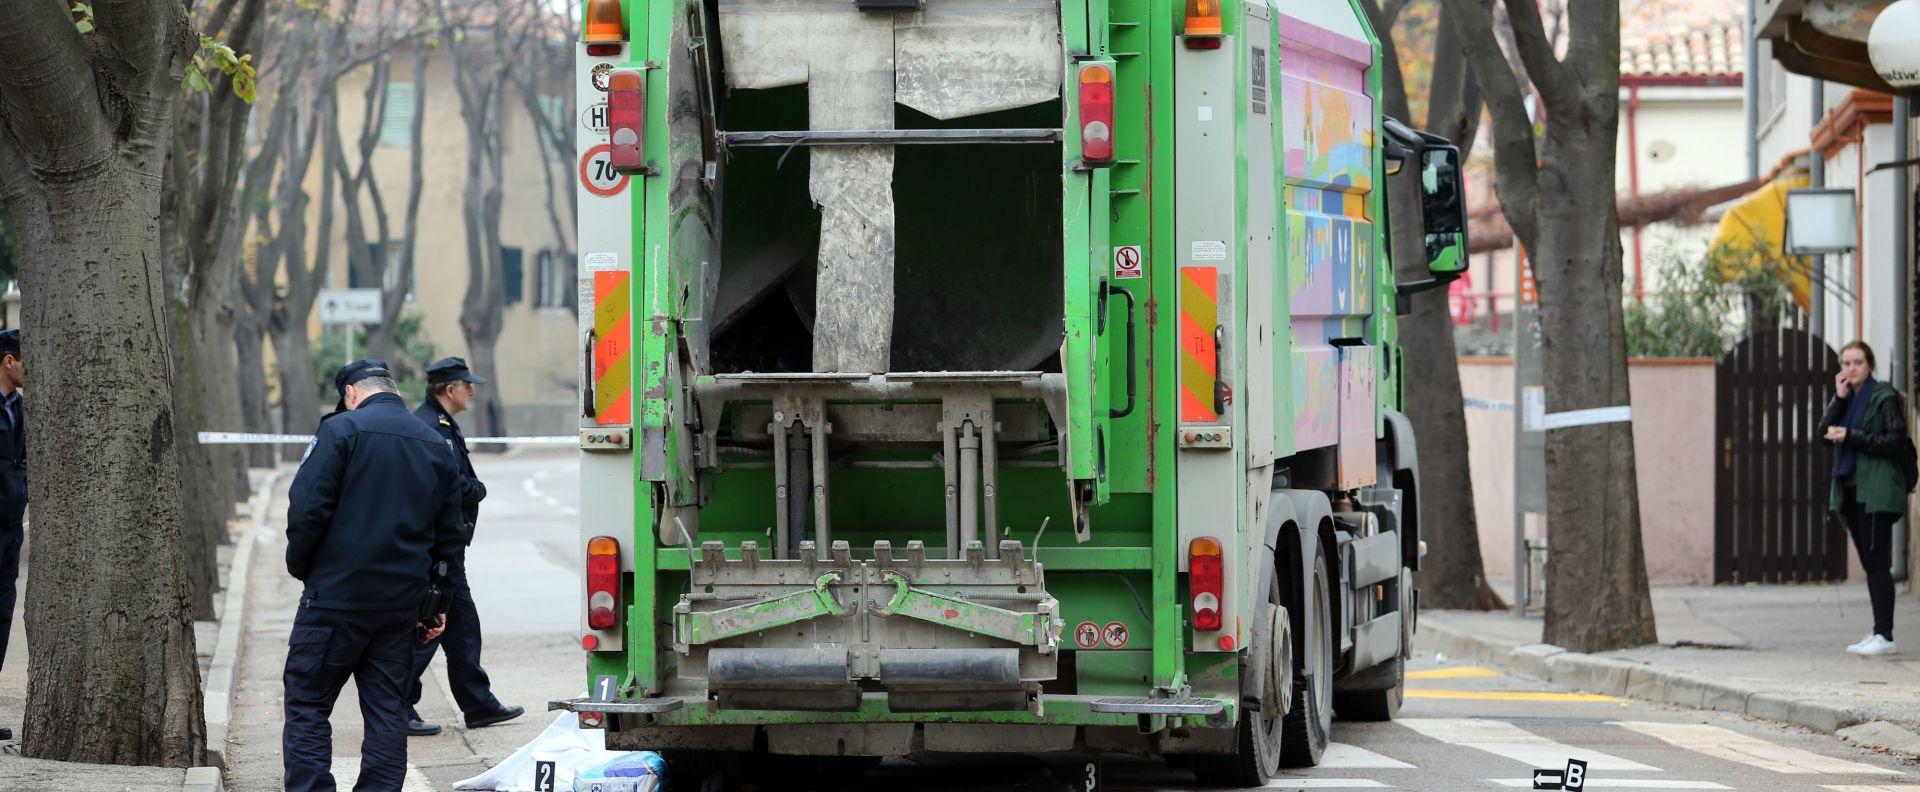 ODRANSKI OBREŽ Kamion Čistoće jutros pregazio smetlara